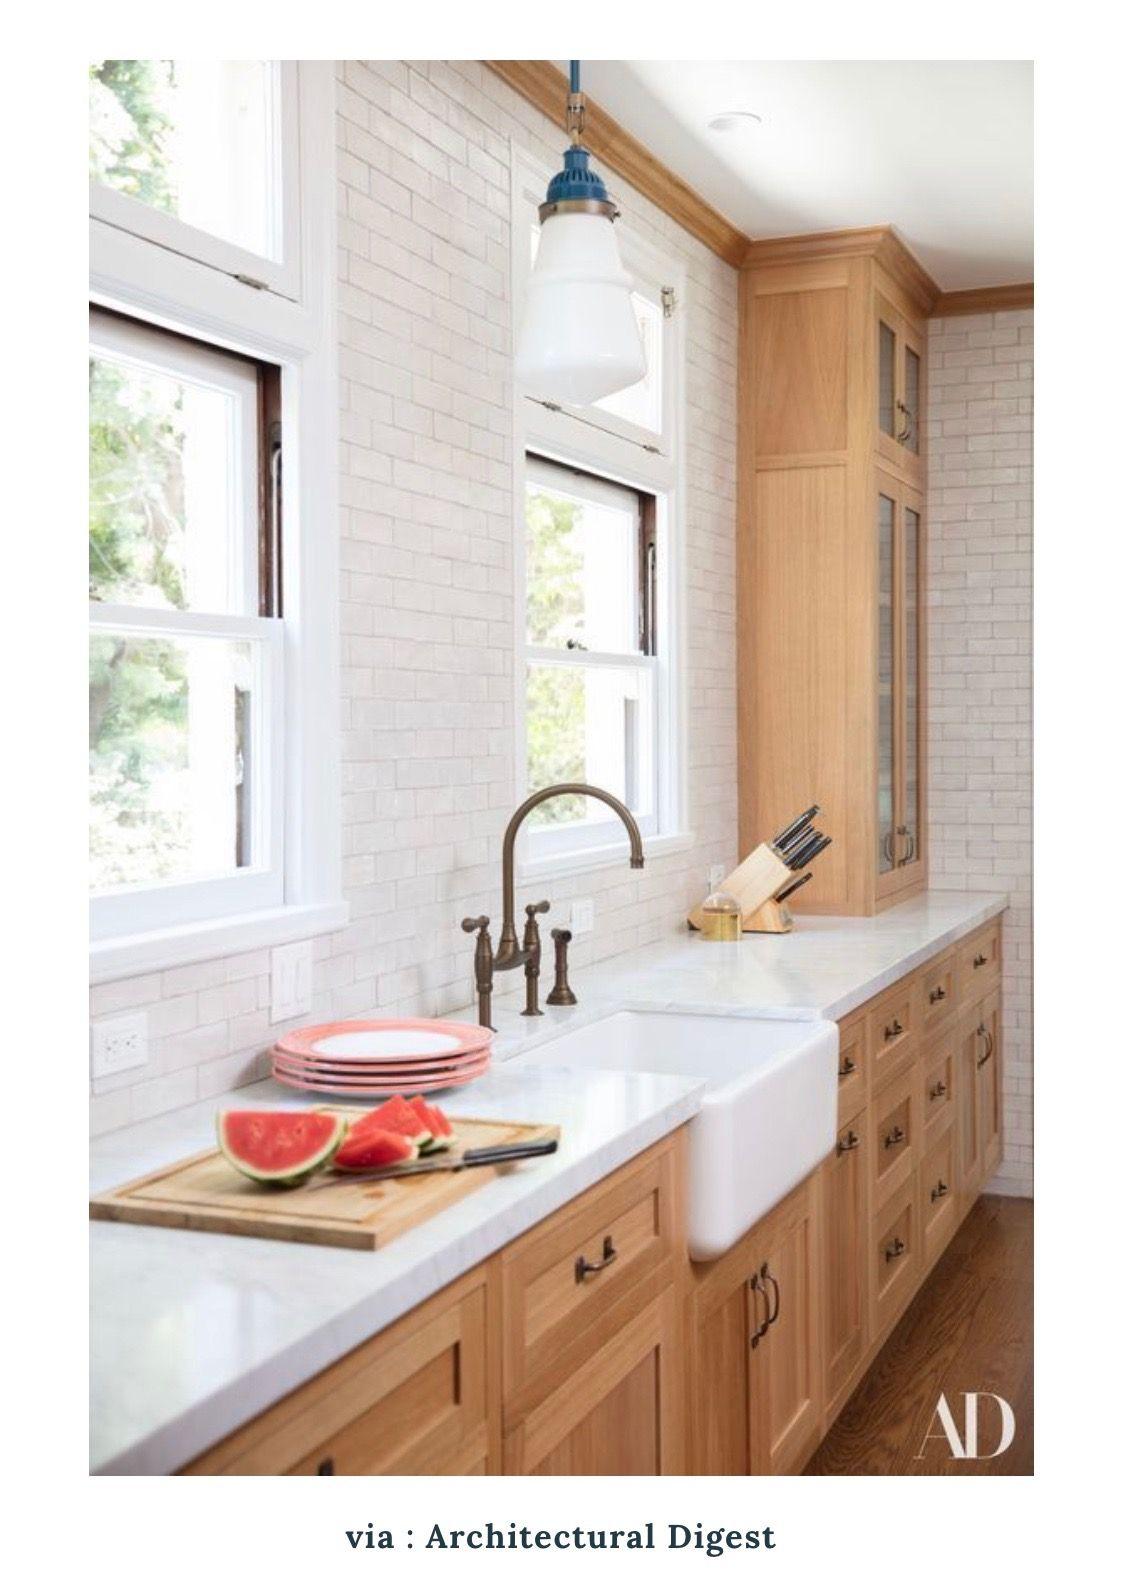 Blonde Wood Cabinets So Warm And Brightens The Kitchen Rustic Kitchen Sinks Upper Kitchen Cabinets Maple Kitchen Cabinets